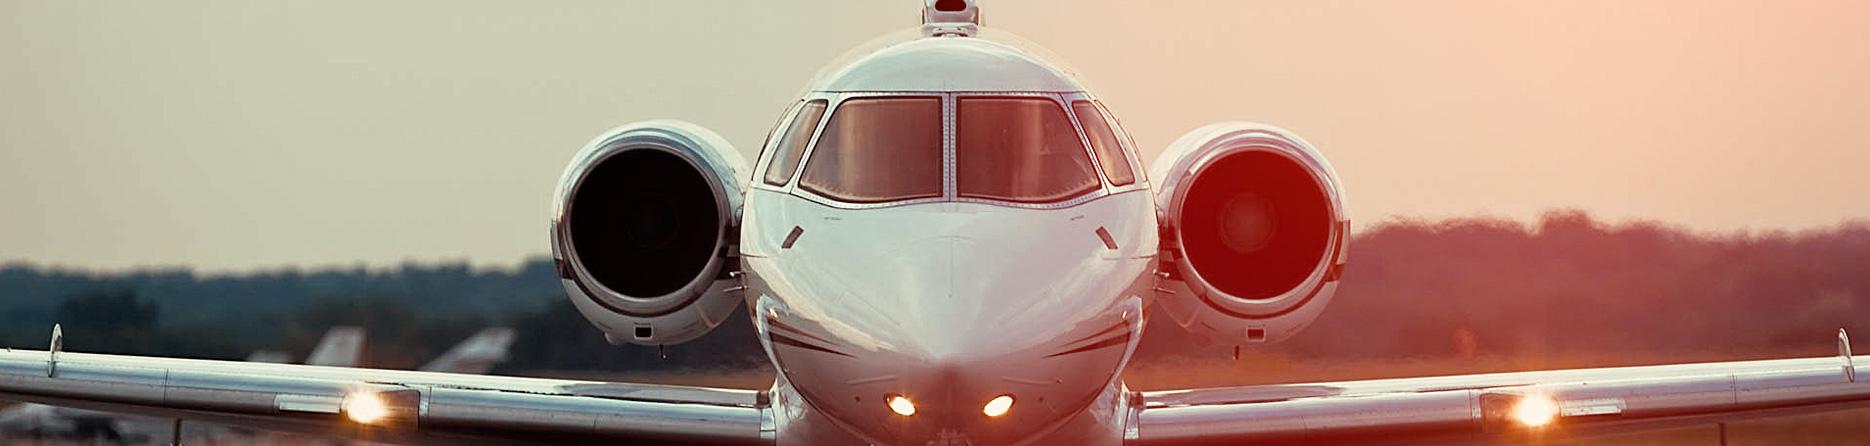 Integrity Aero